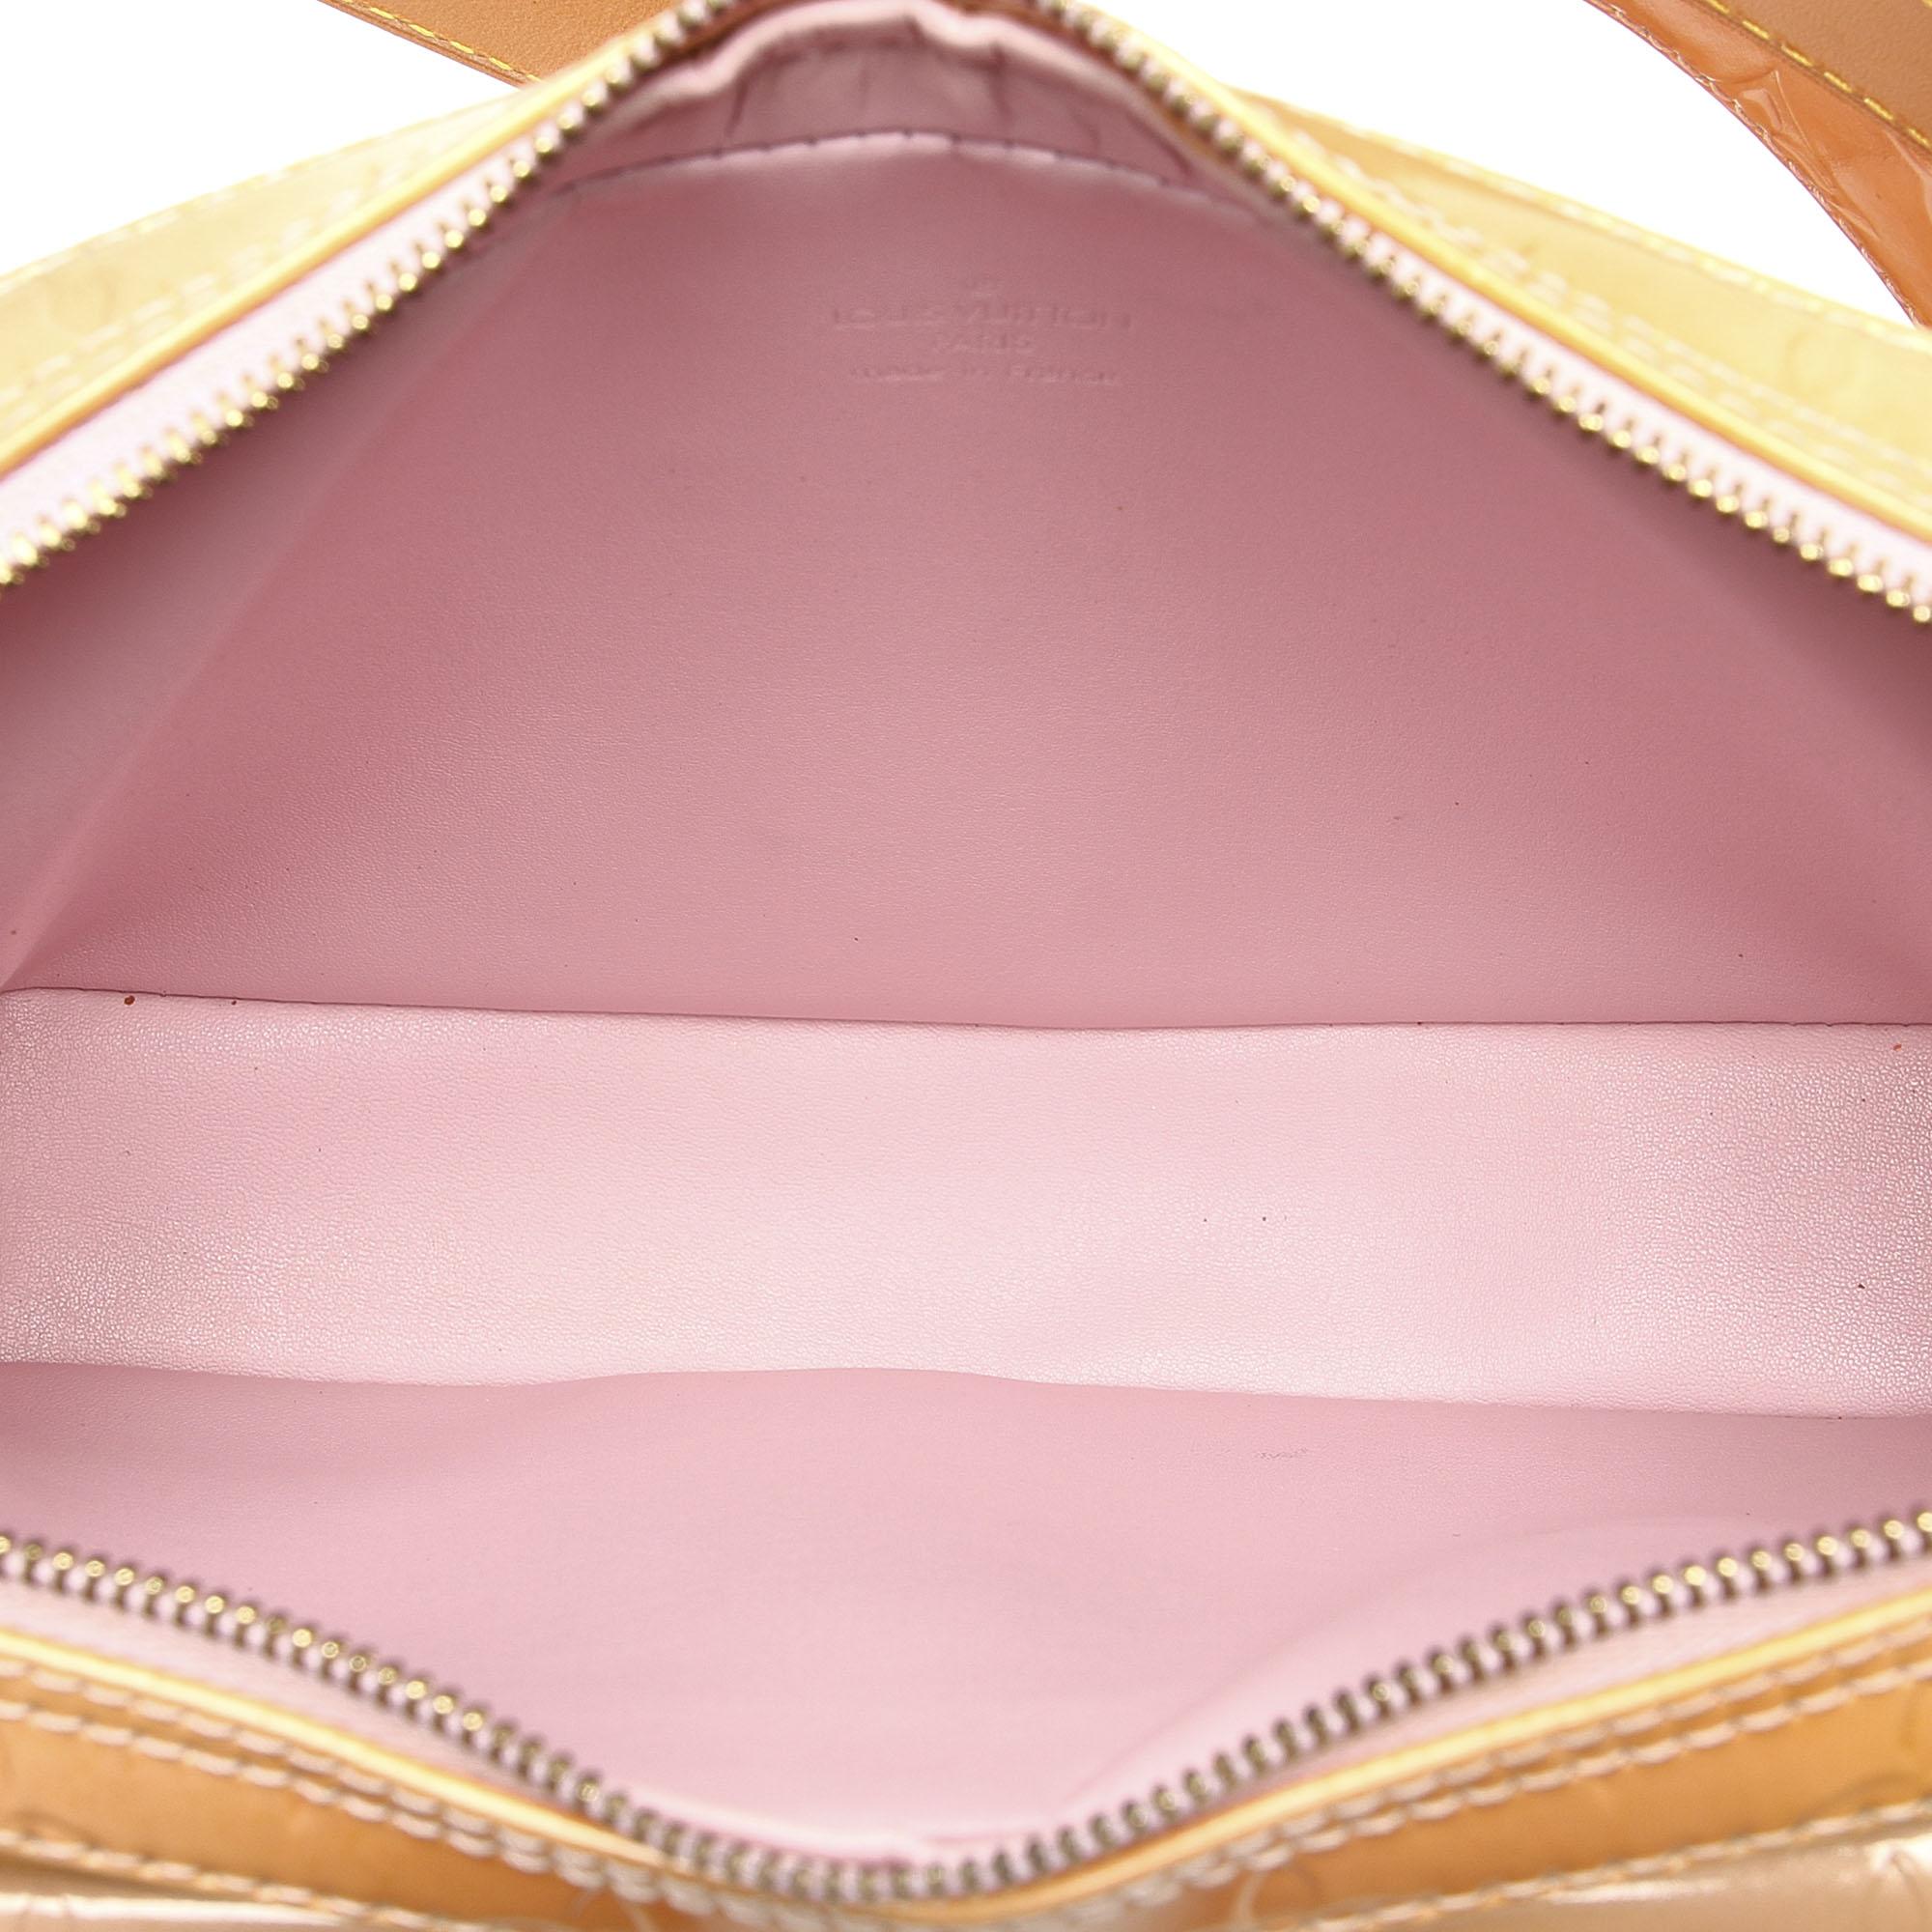 Louis Vuitton Vernis Fulton